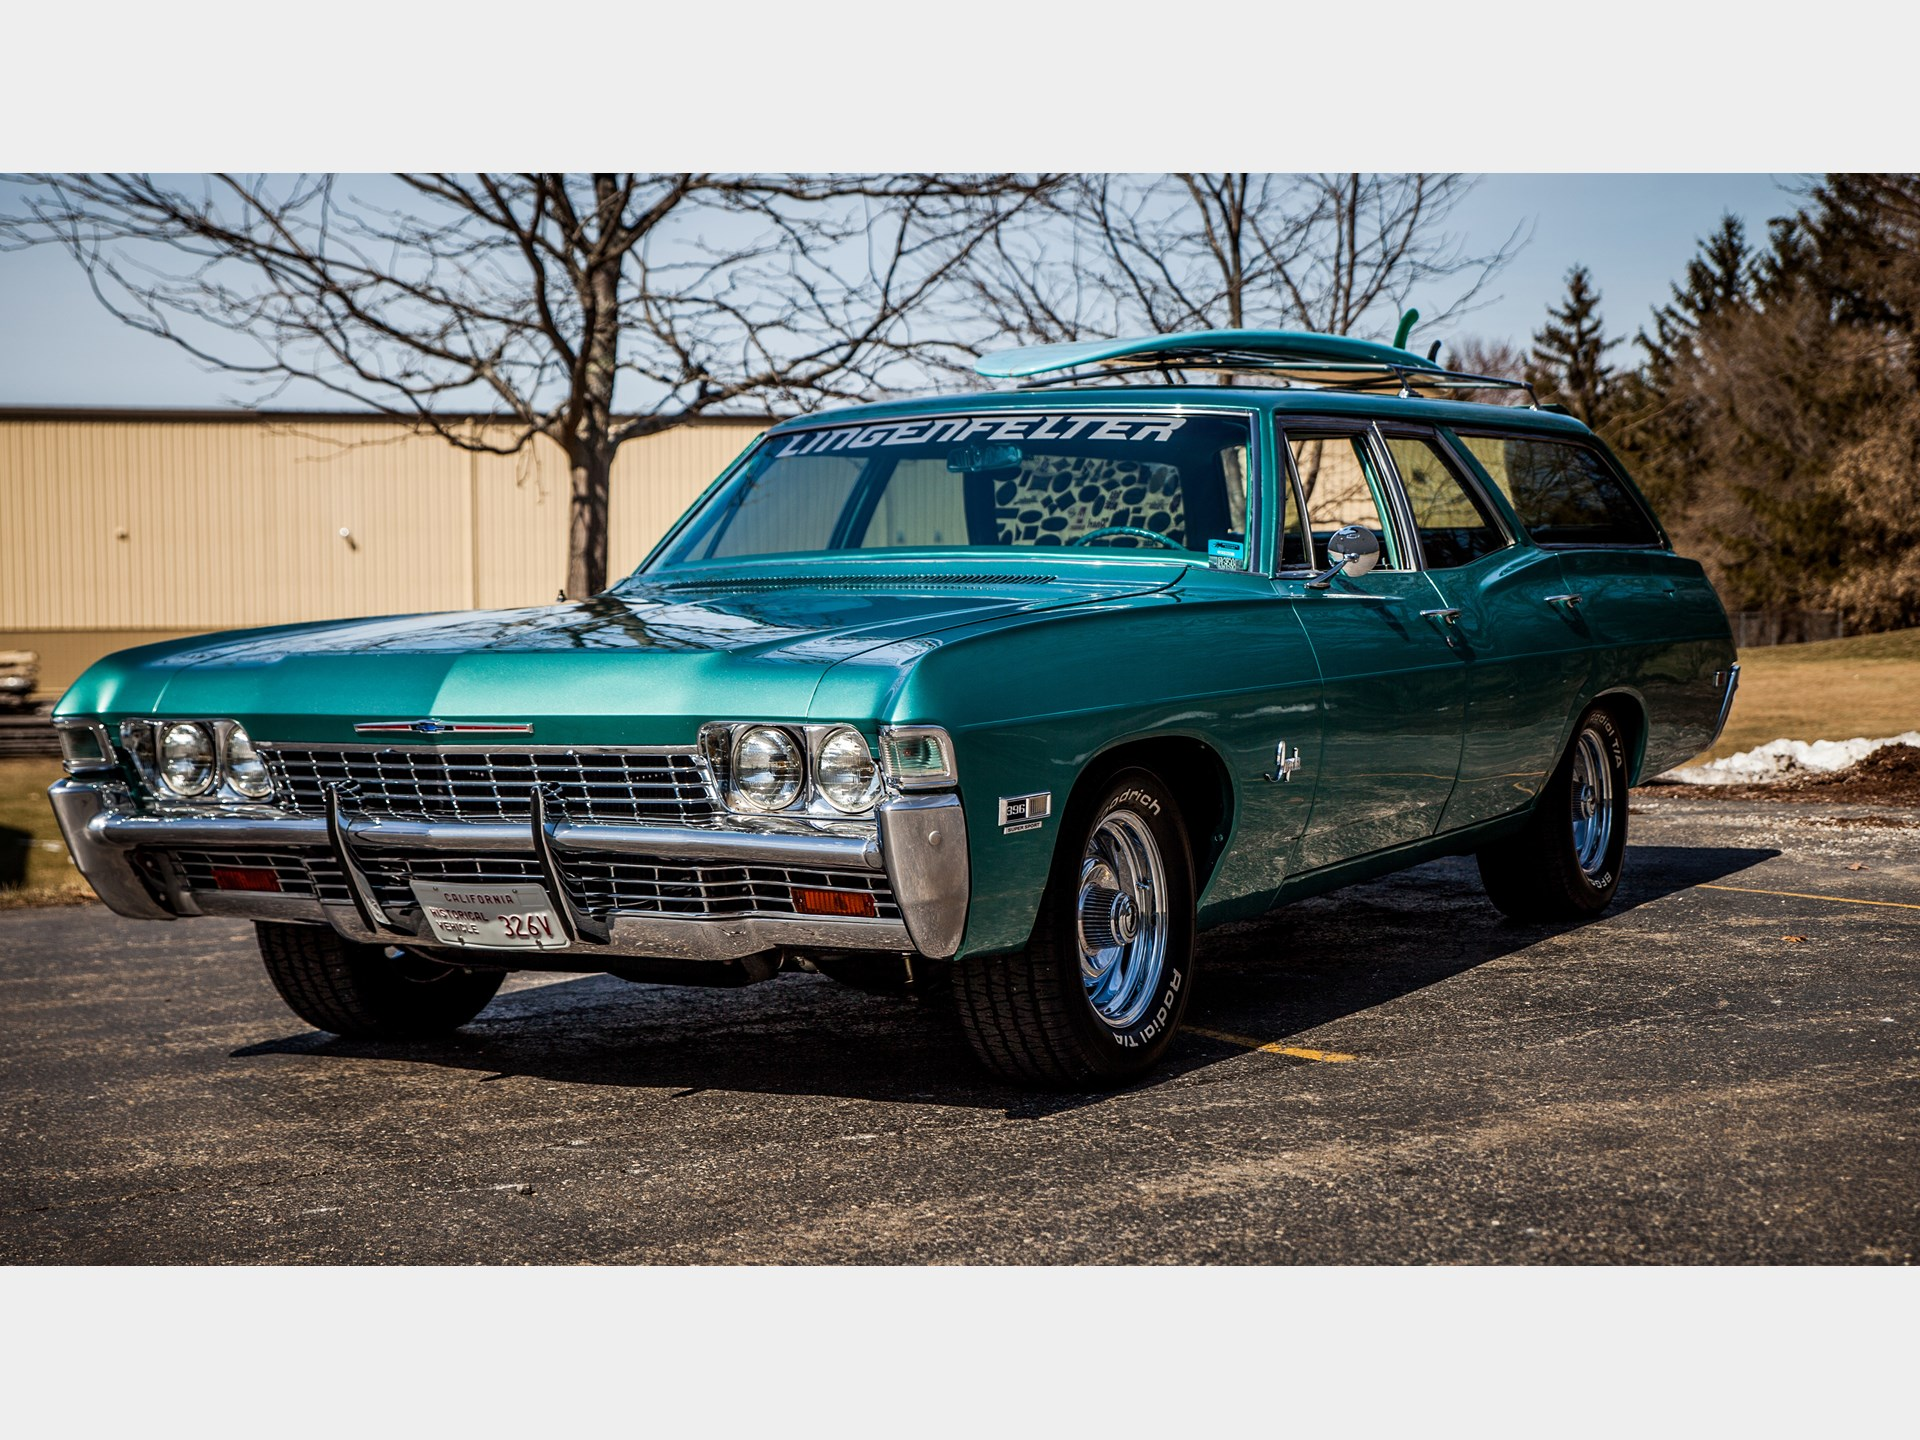 1968 Chevrolet Impala SS Station Wagon